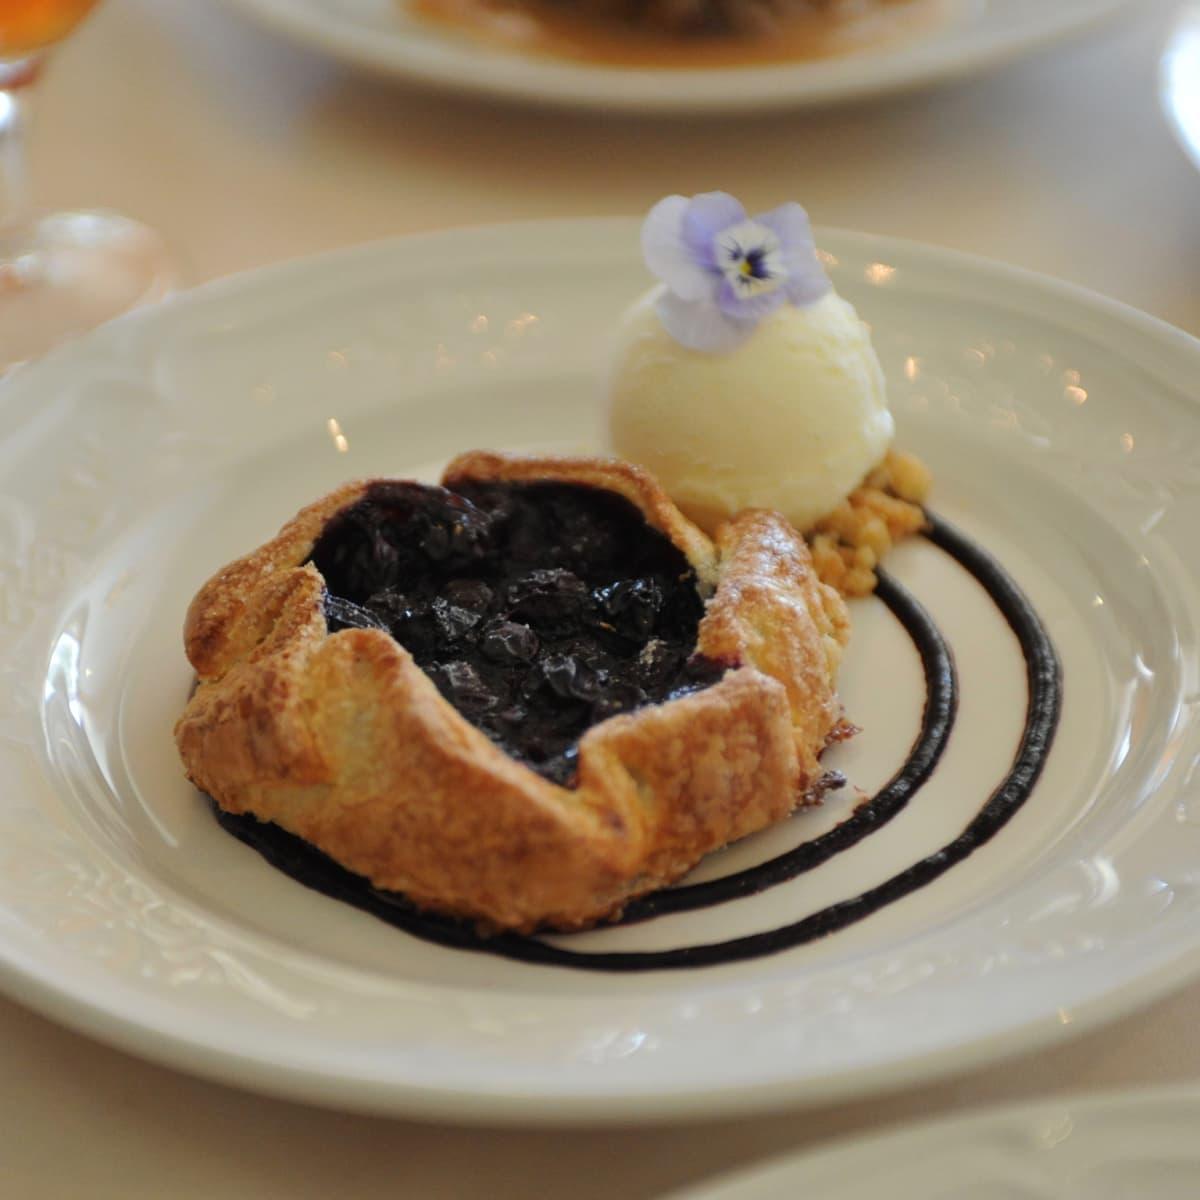 Manor House blueberry tart